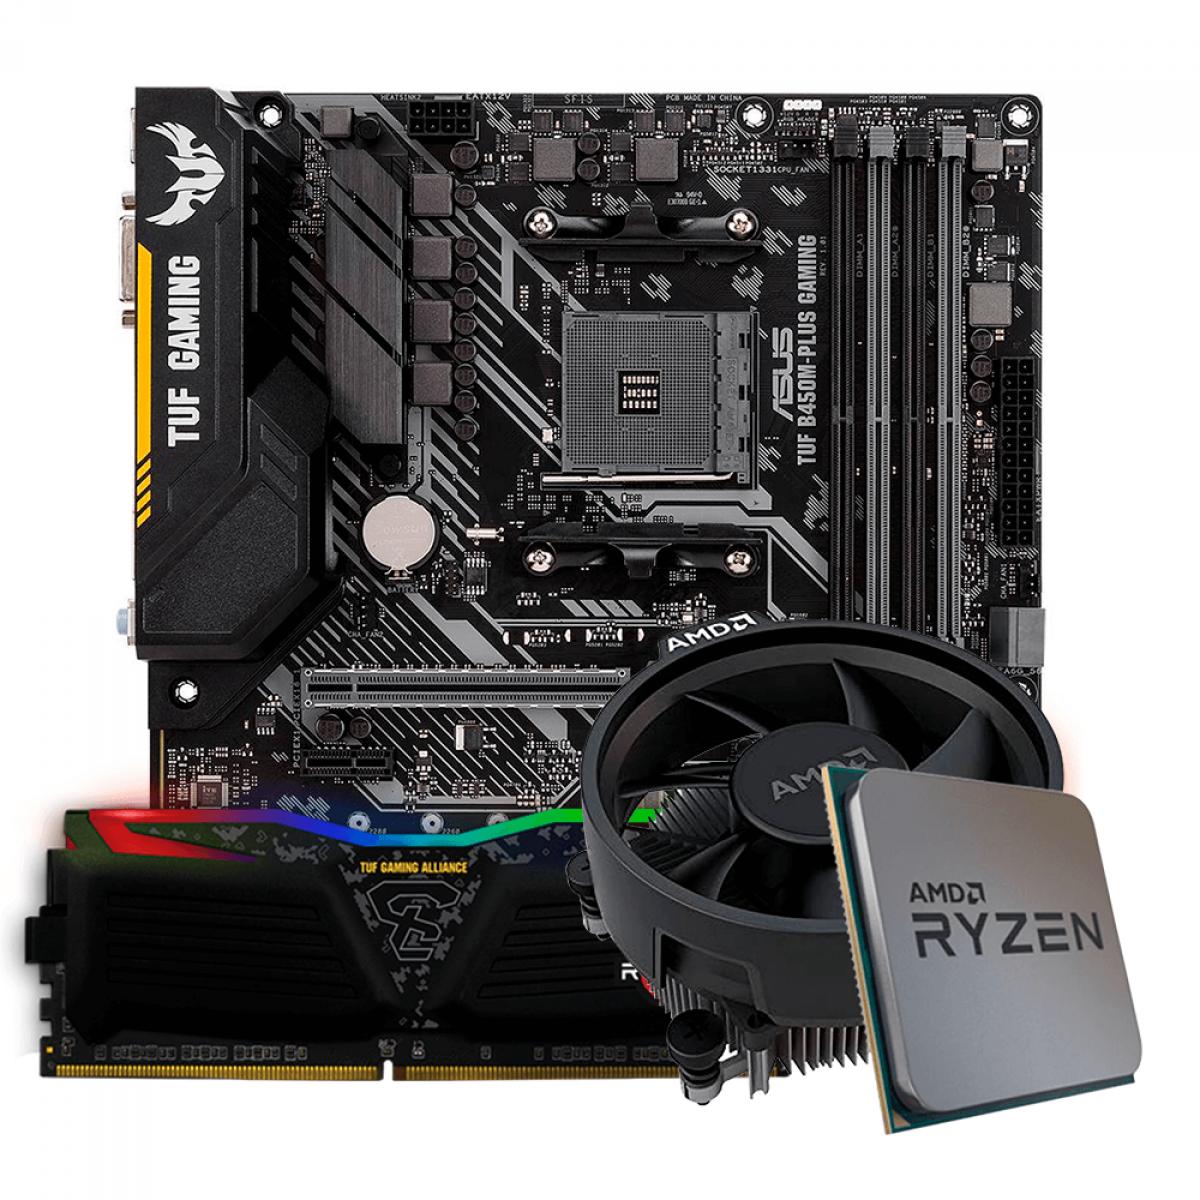 Kit Upgrade, AMD Ryzen 5 3600, Asus TUF B450M-PLUS GAMING, Memória TUF DDR4 8GB 3000MHz